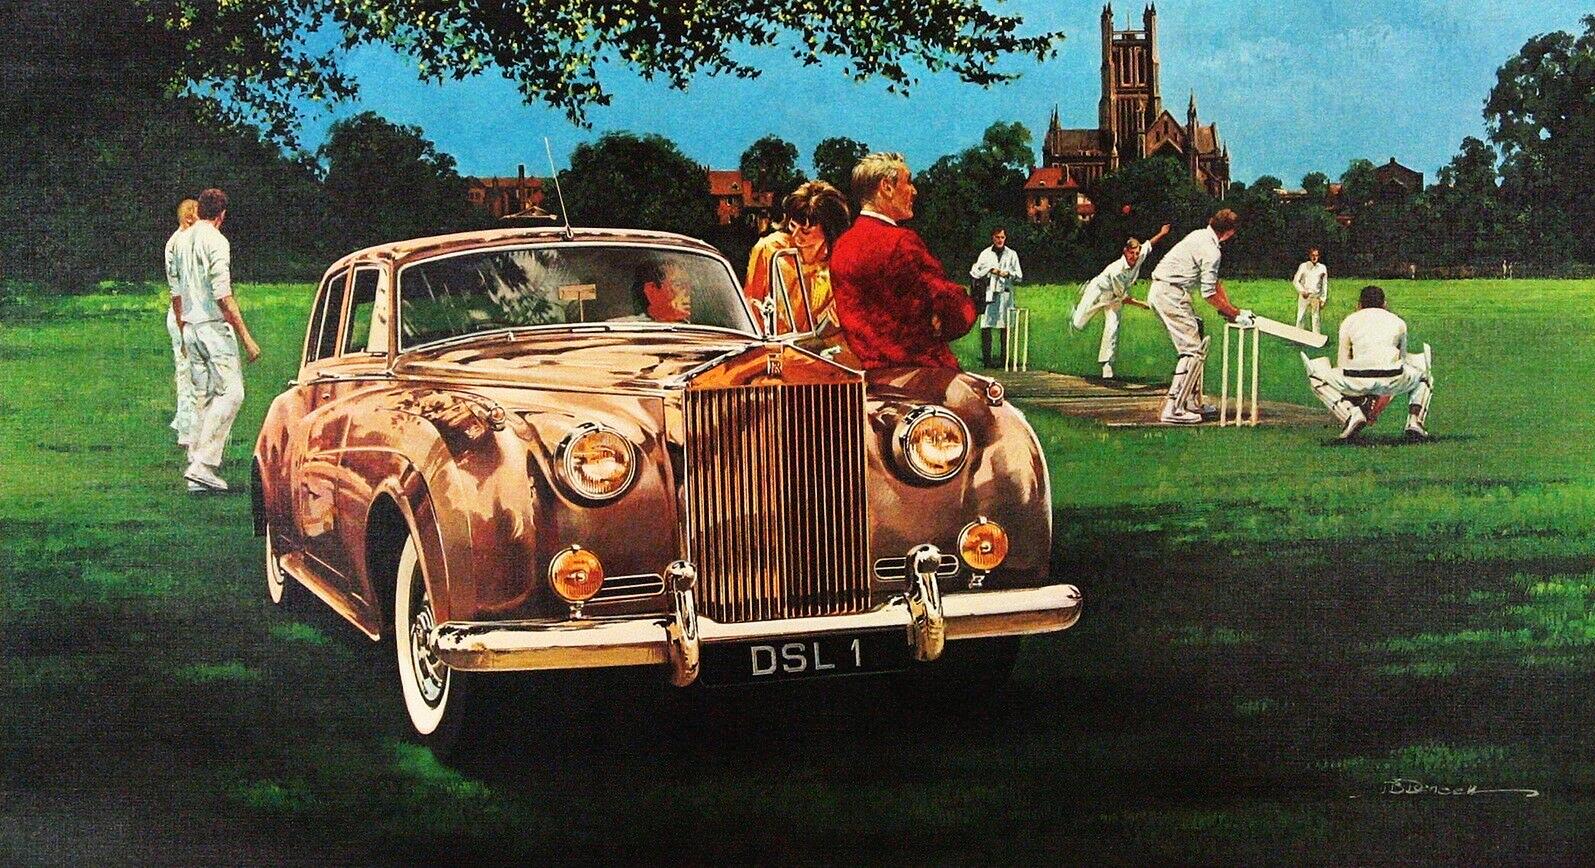 1962. Rolls-Royce Silver Cloud II. Illustrated by James B. Deneen